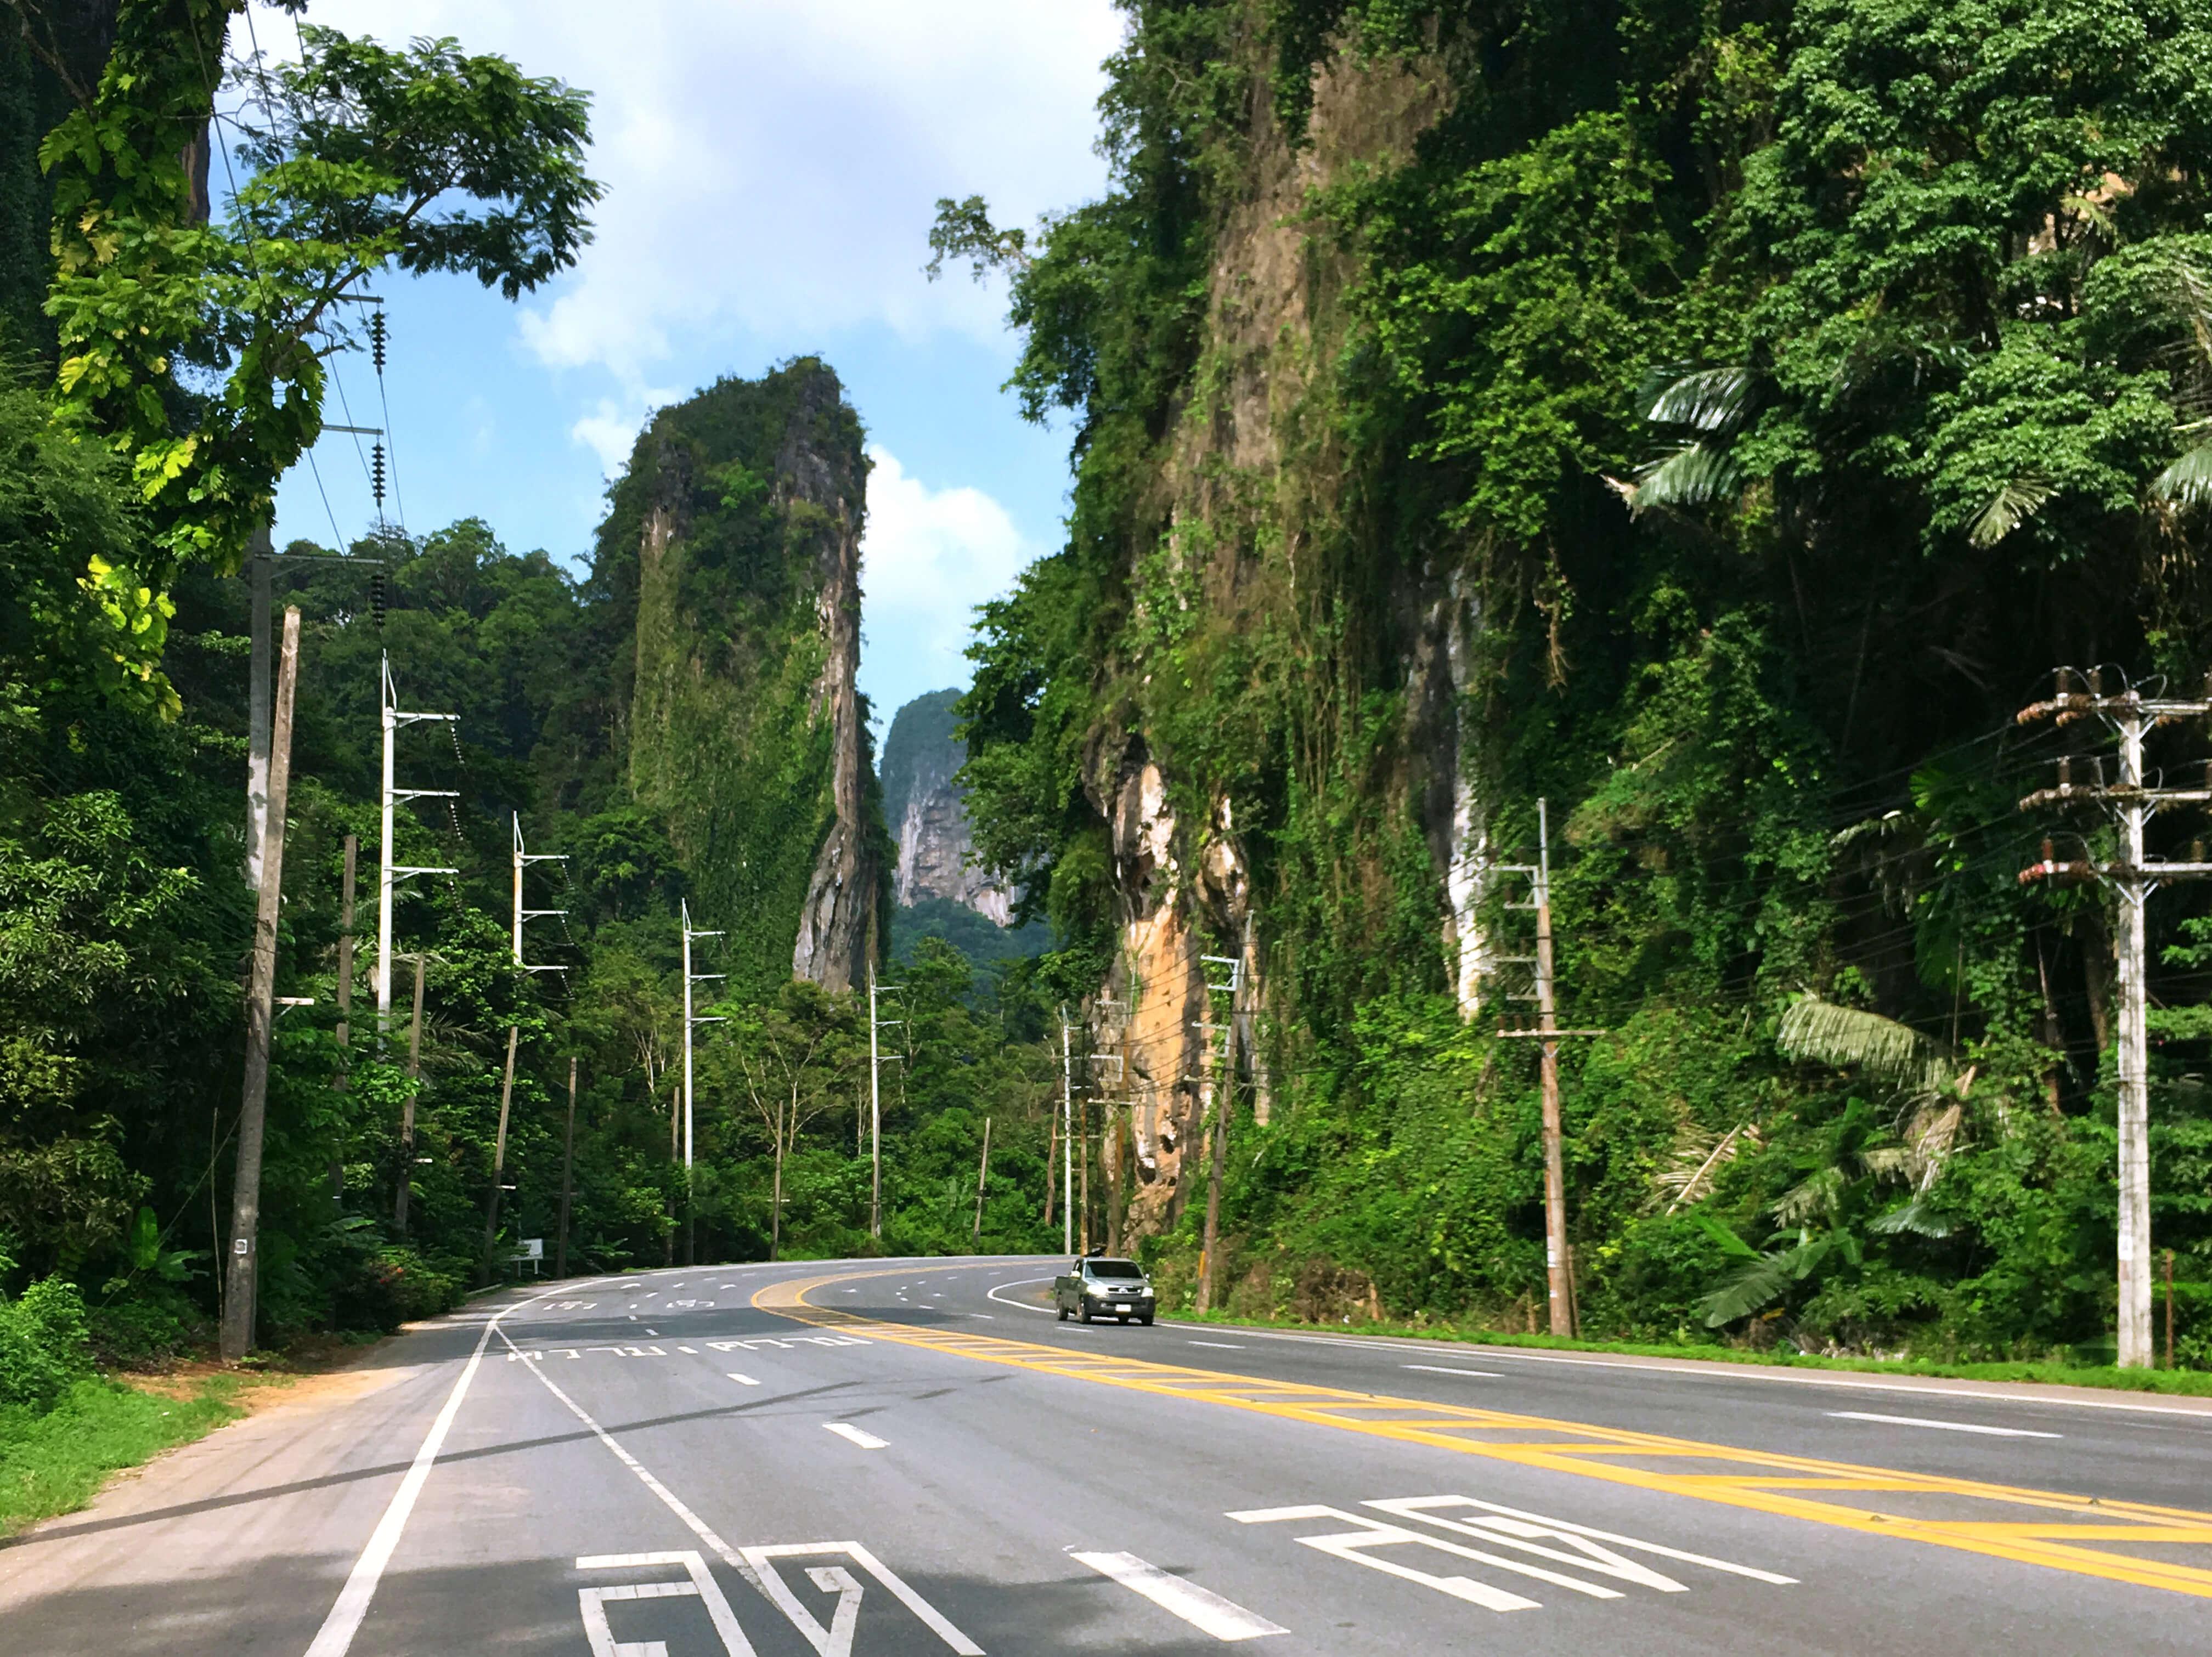 Krabi, road, mountains, krabi nature, Краби, дорога, горы, природа краби